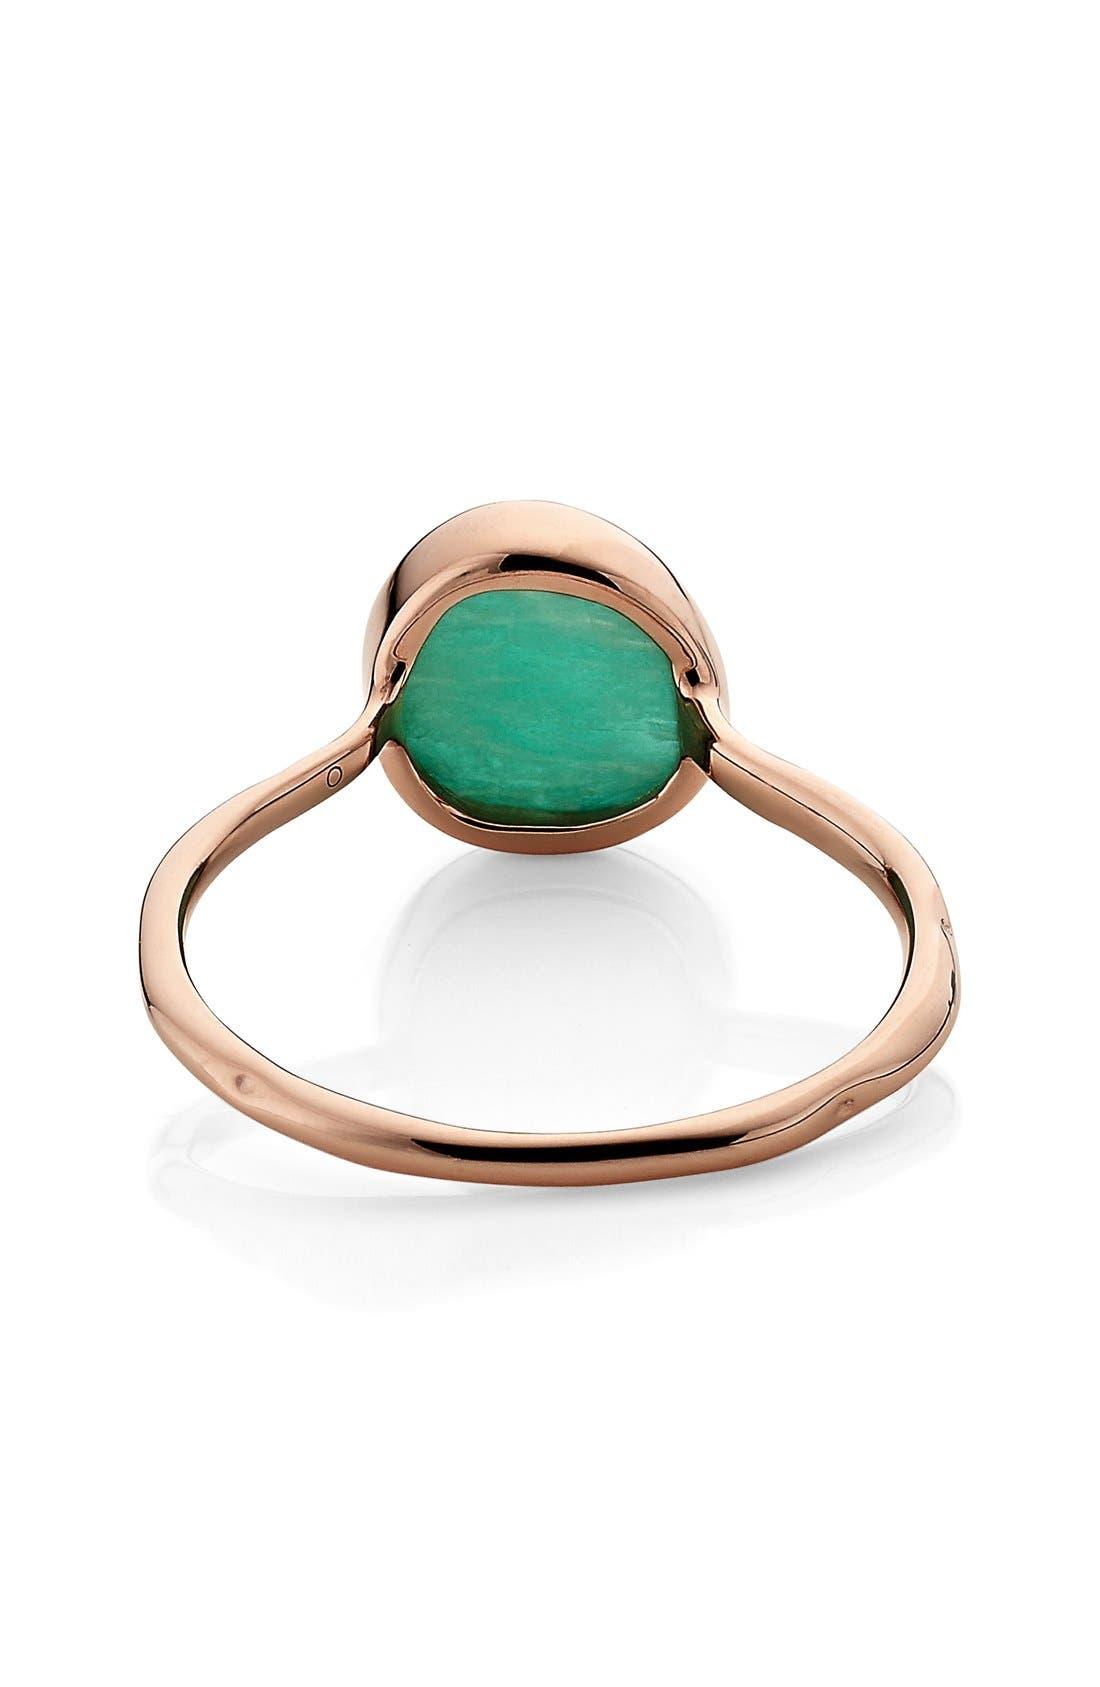 Alternate Image 3  - Monica Vinader 'Siren' Semiprecious Stone Stacking Ring